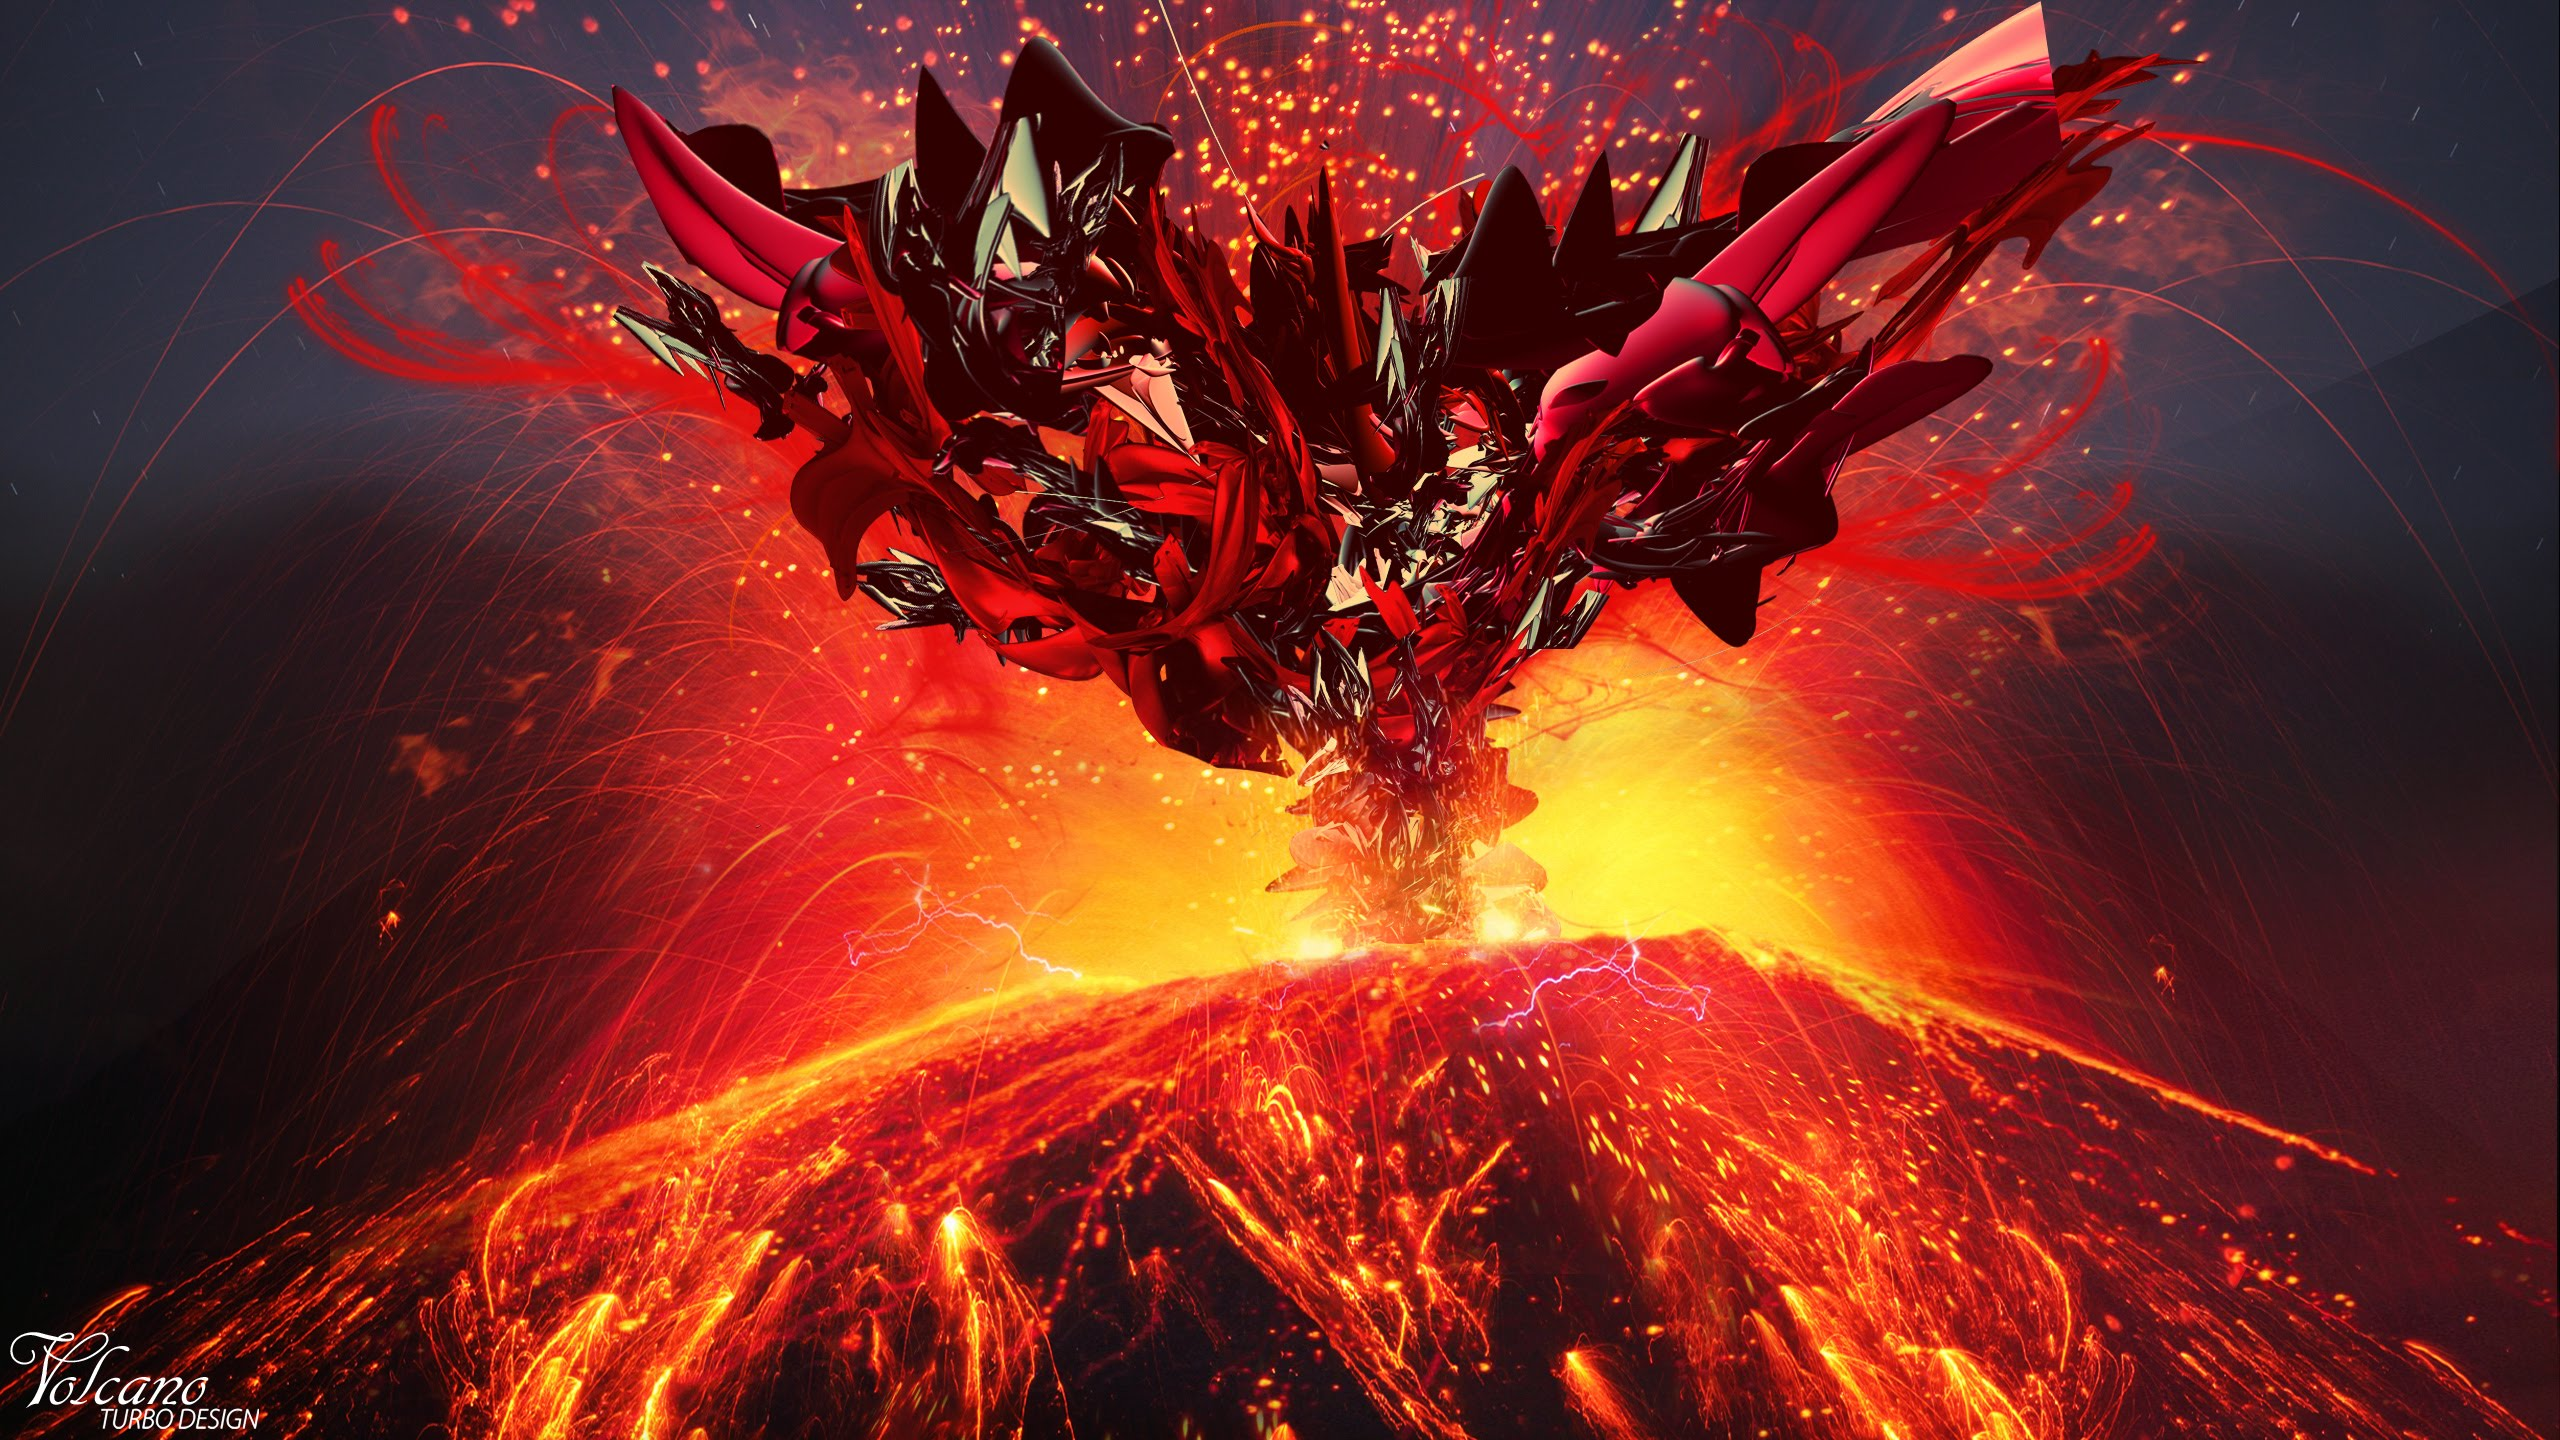 Volcano Live Wallpaper - YouTube